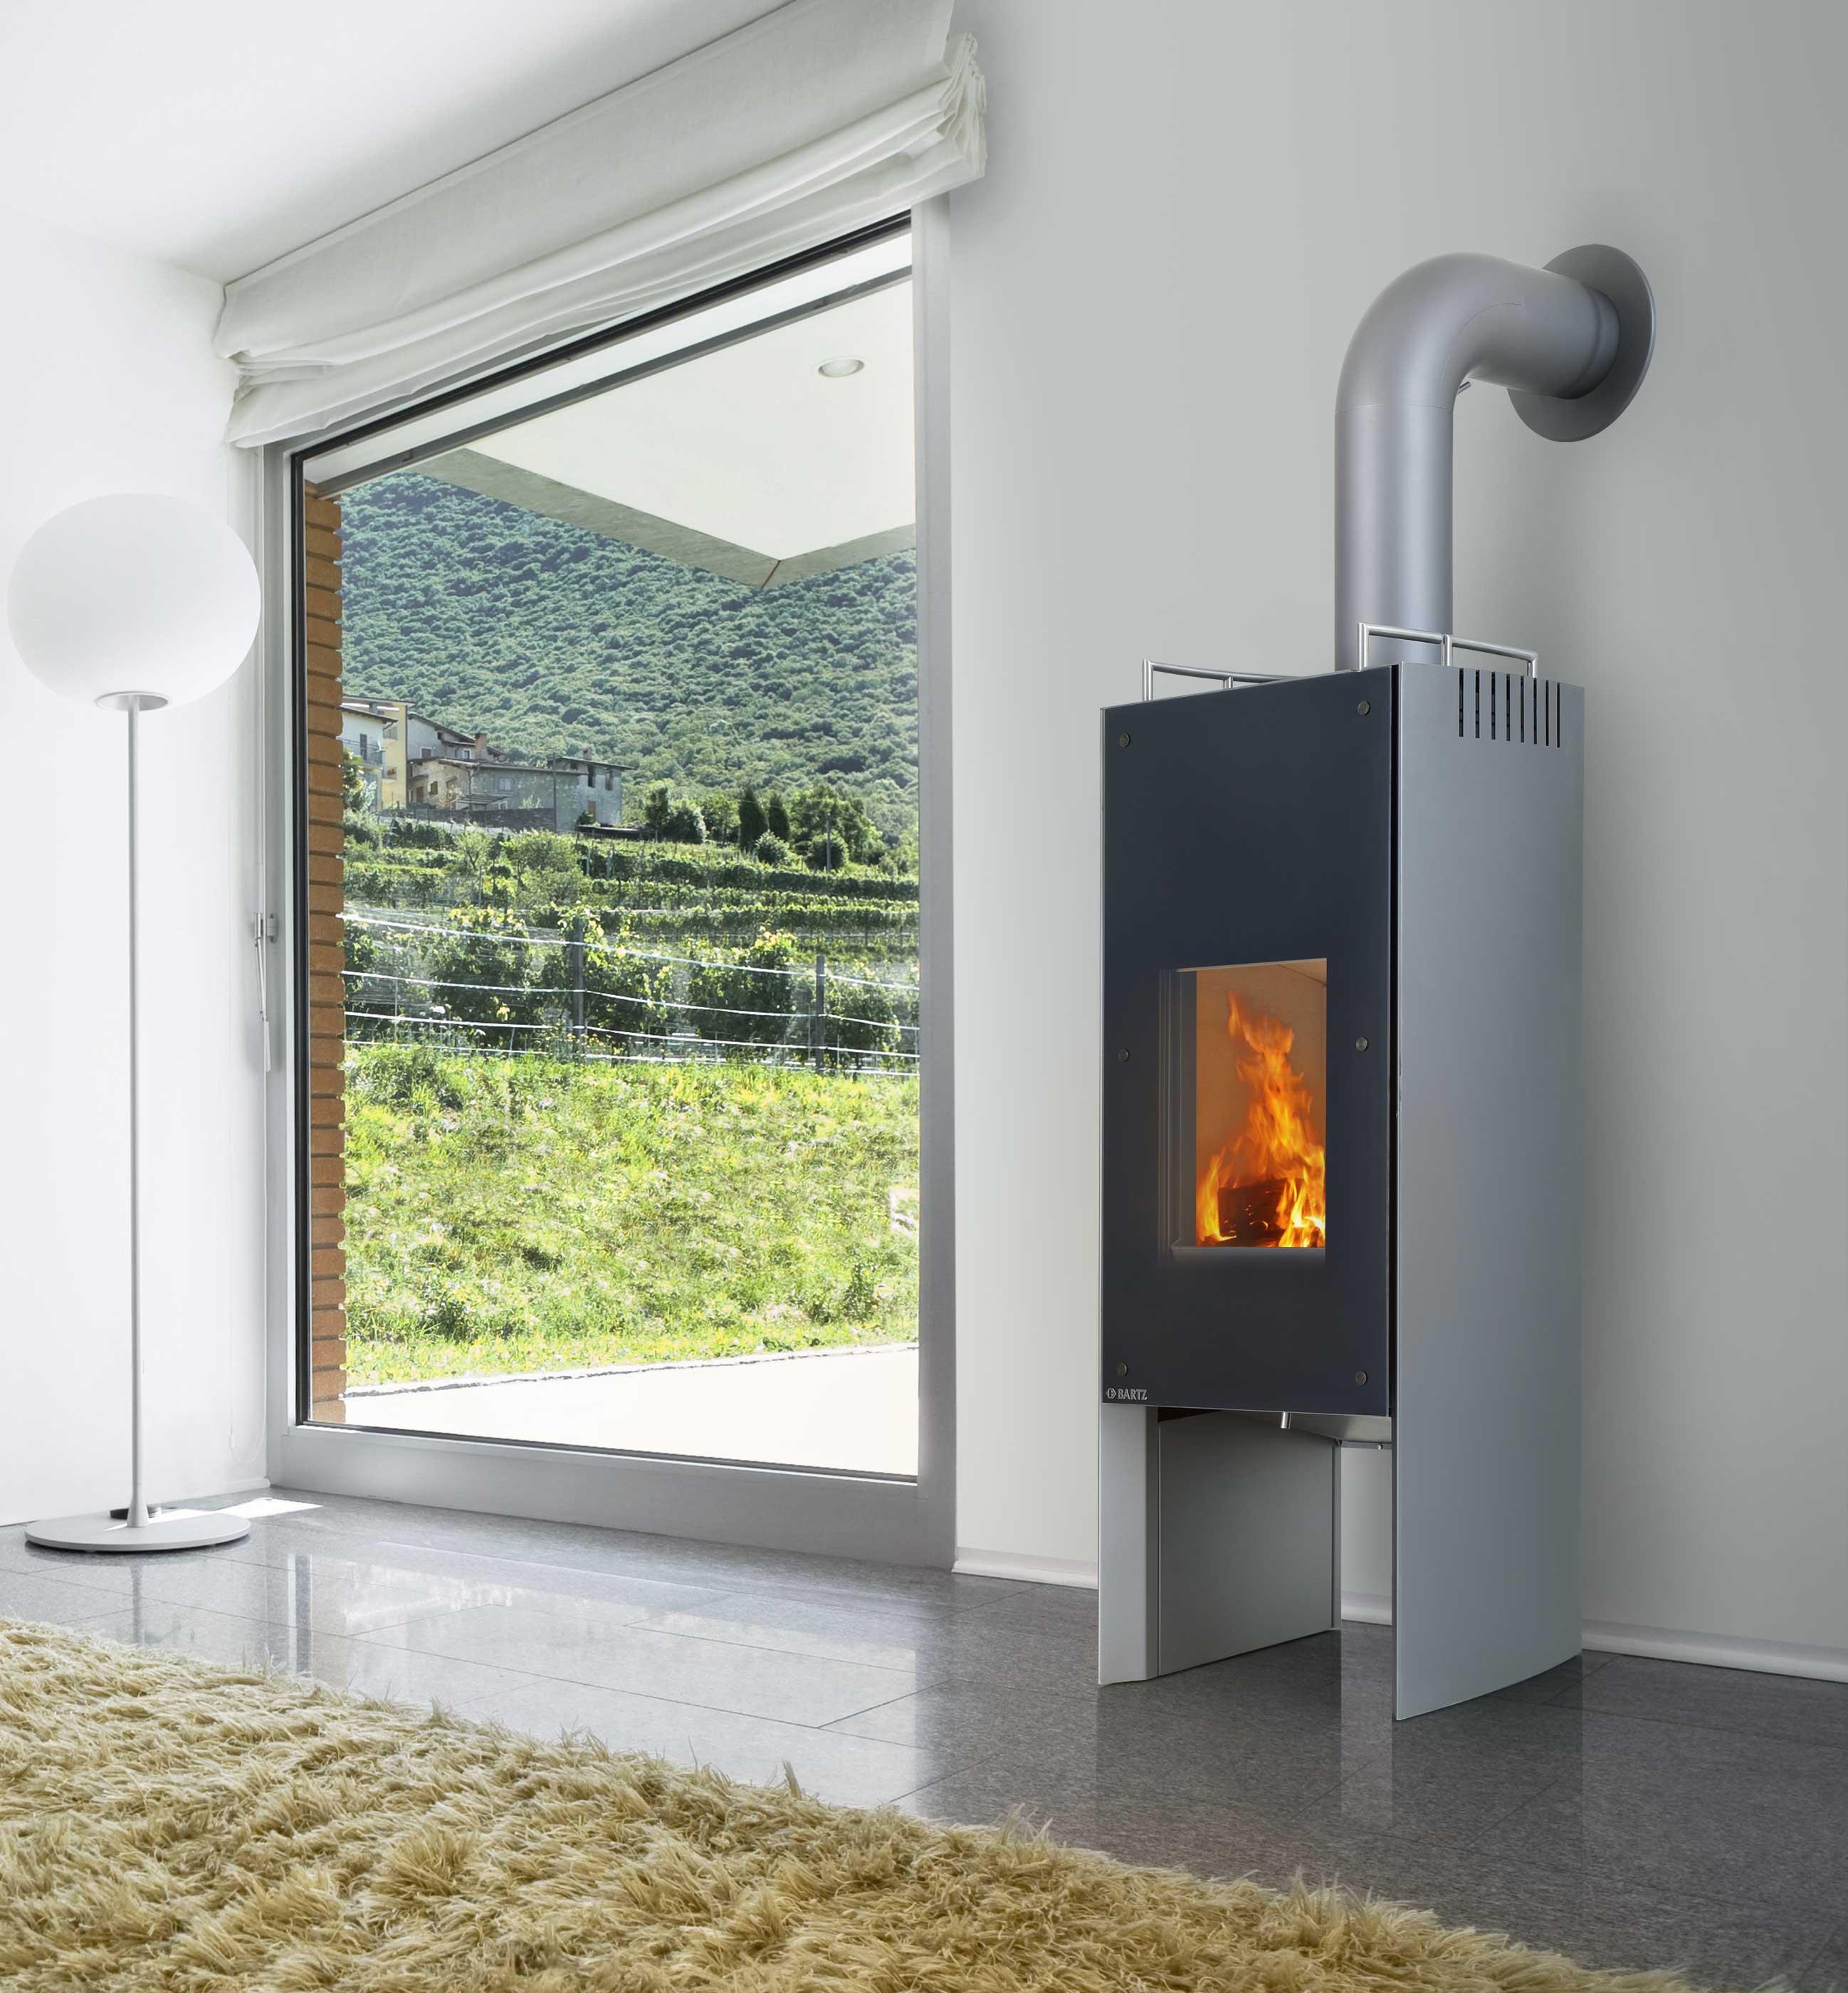 kaminofen bartz bregenz raumluftunabh ngig stahl grau 6kw bei. Black Bedroom Furniture Sets. Home Design Ideas